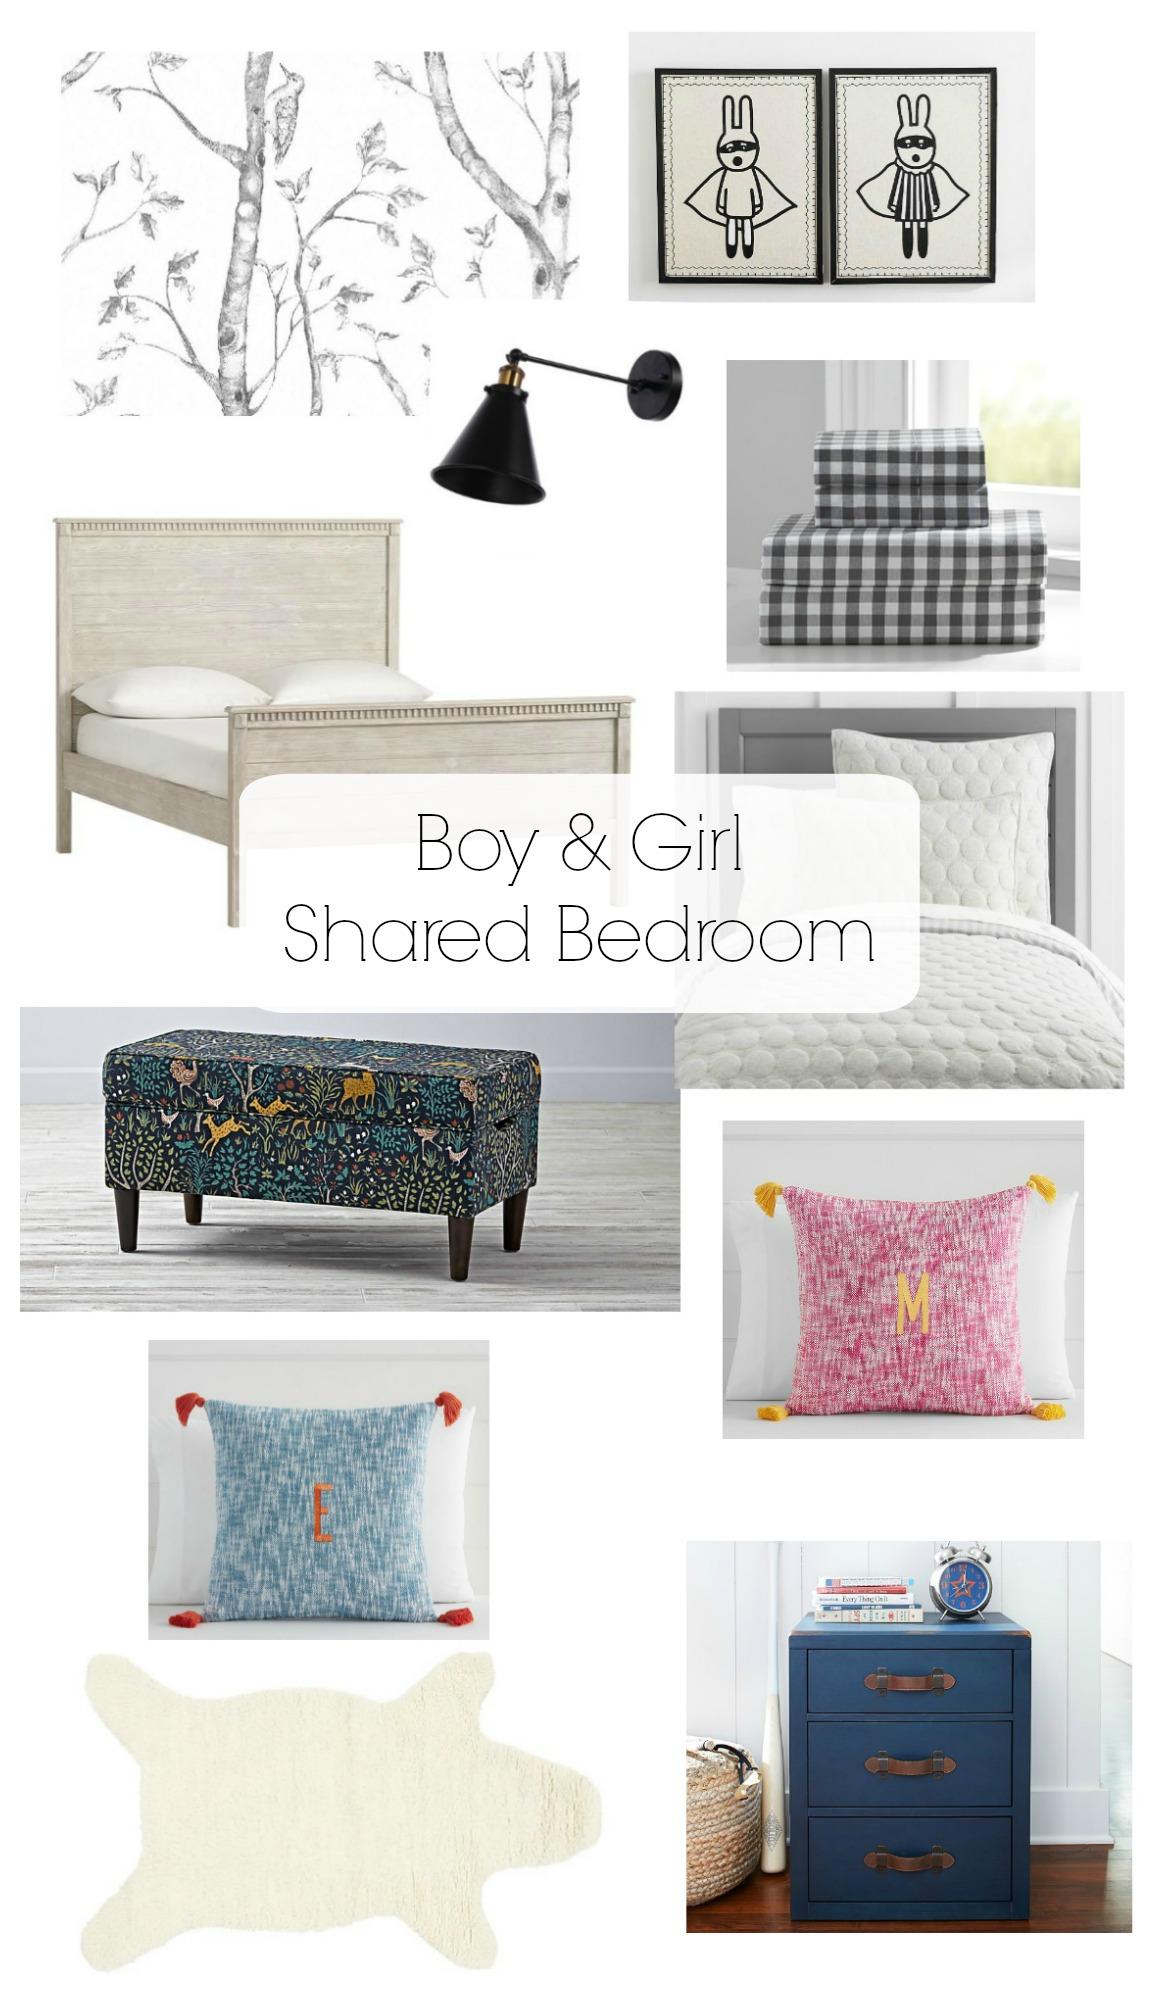 Boy and Girl Shared Bedroom Idea